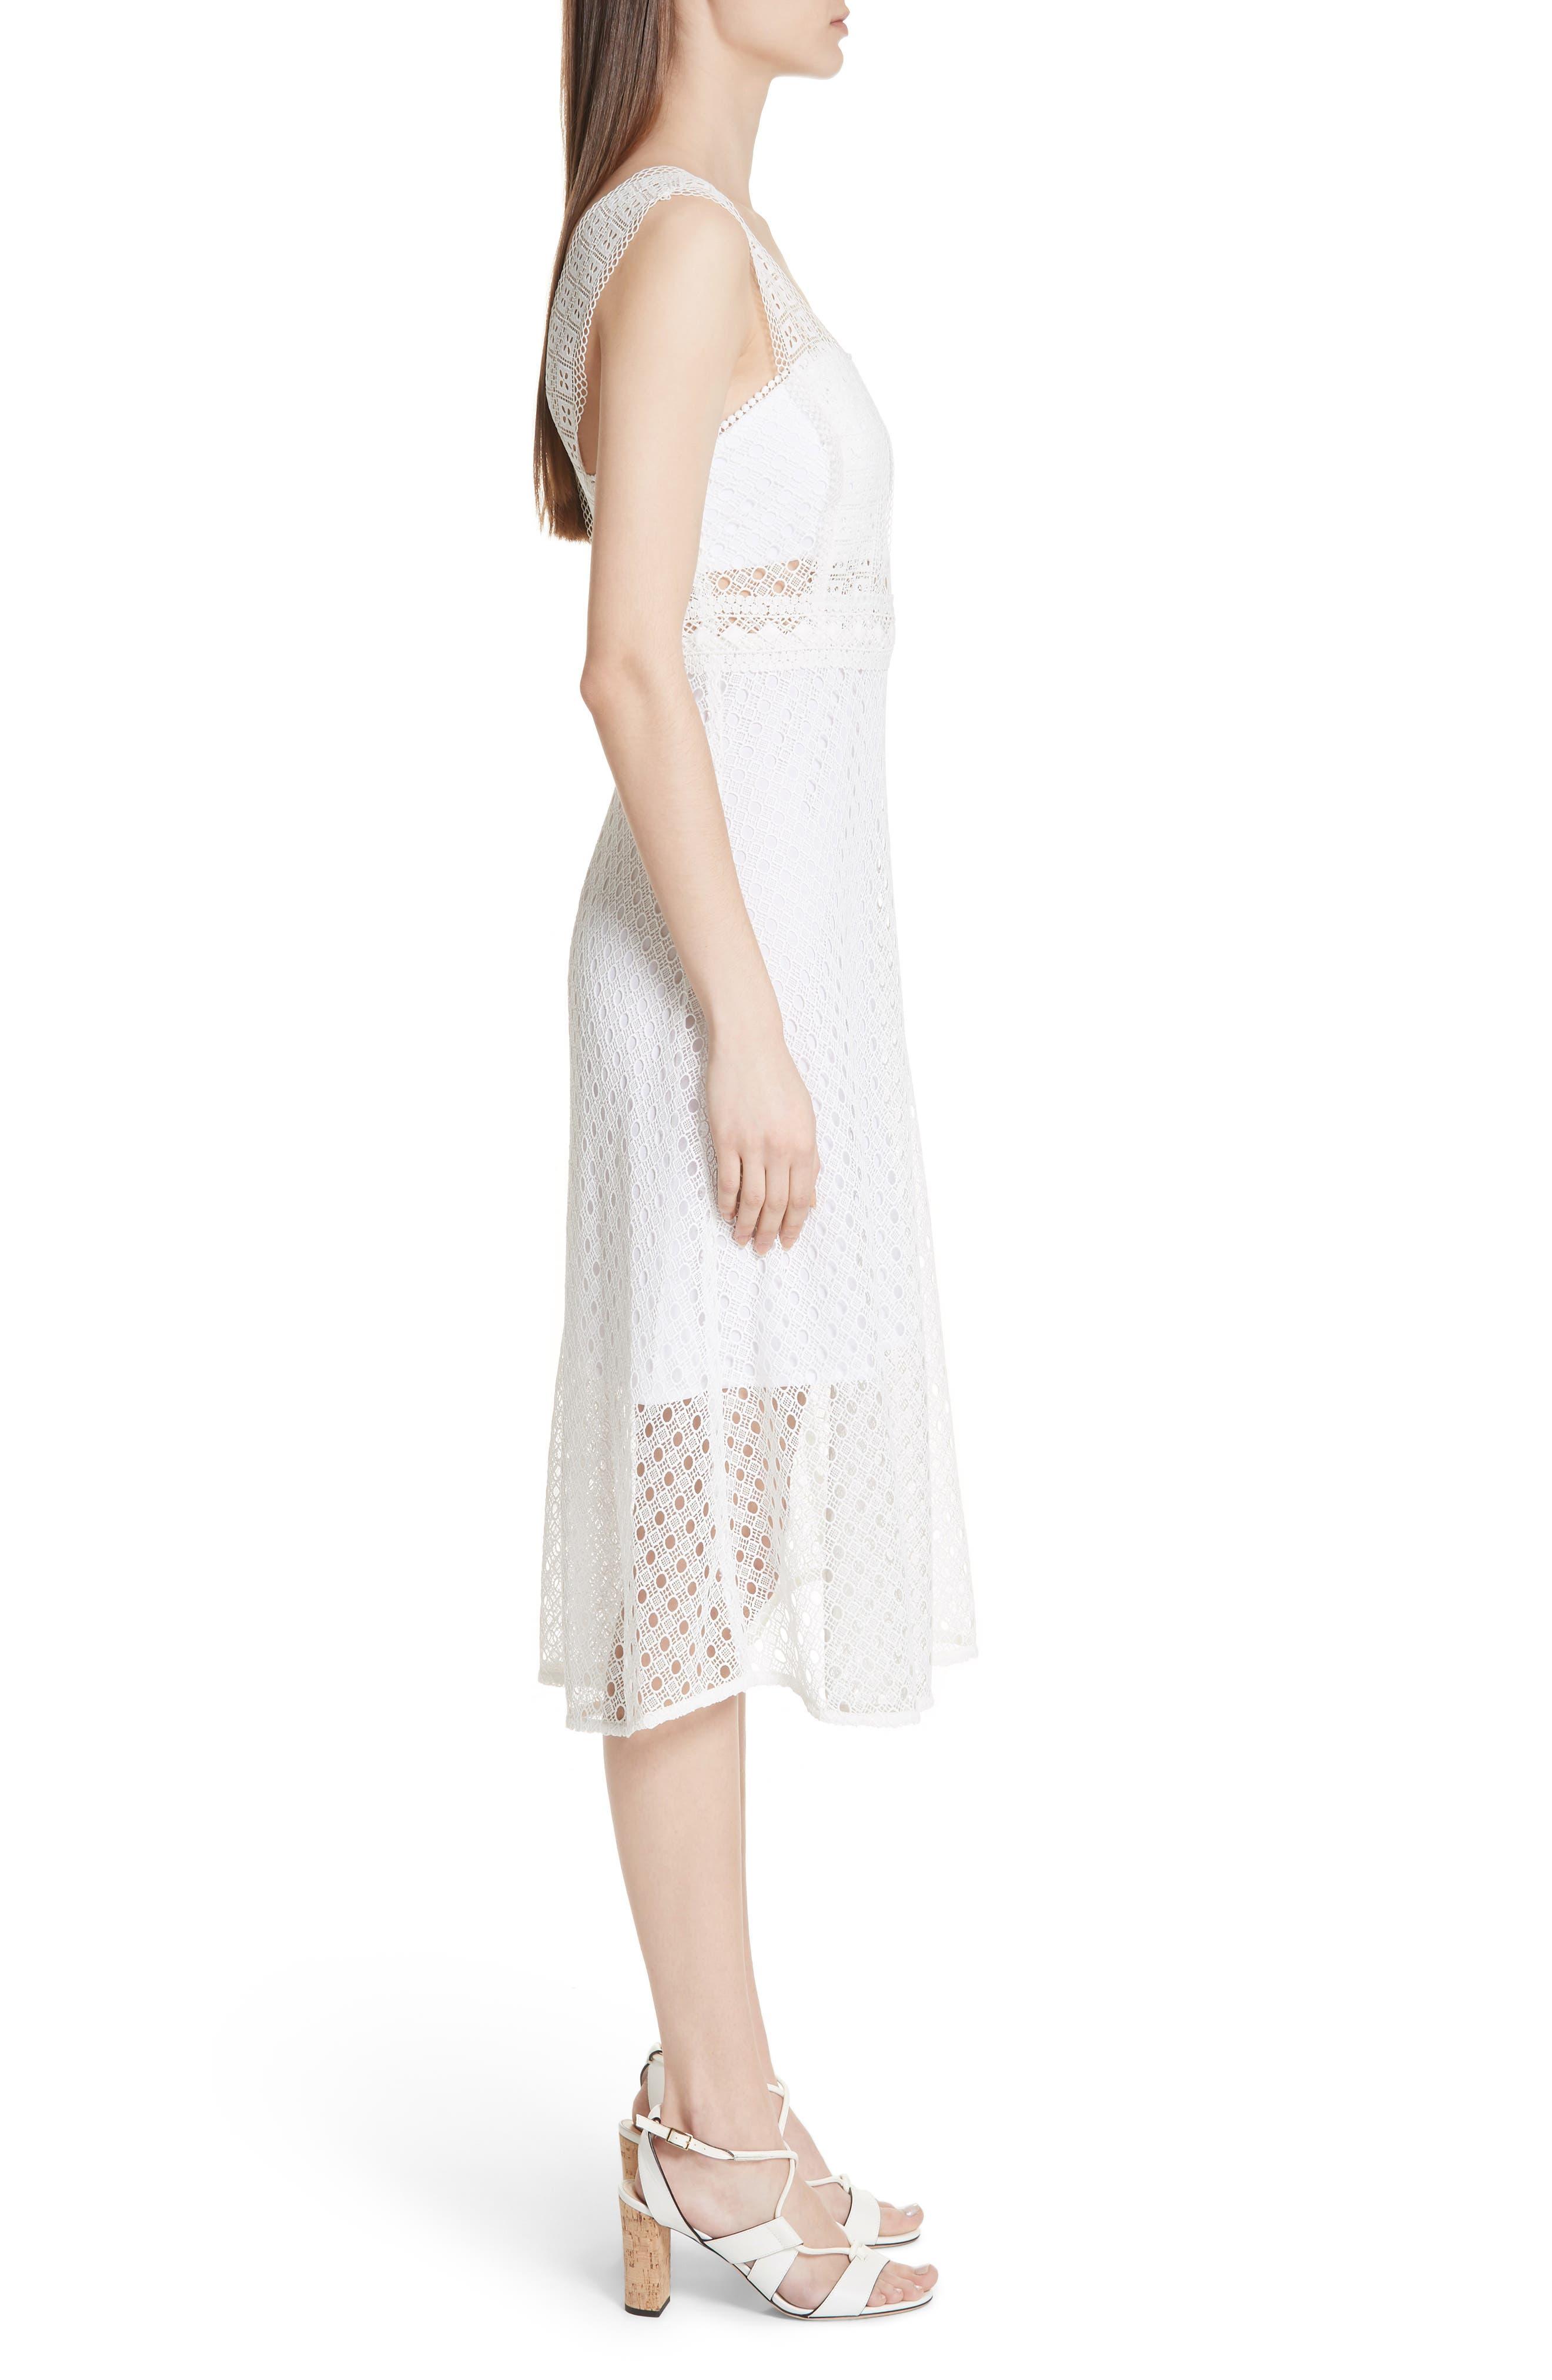 Blanc Lace Square Neck Dress,                             Alternate thumbnail 3, color,                             100